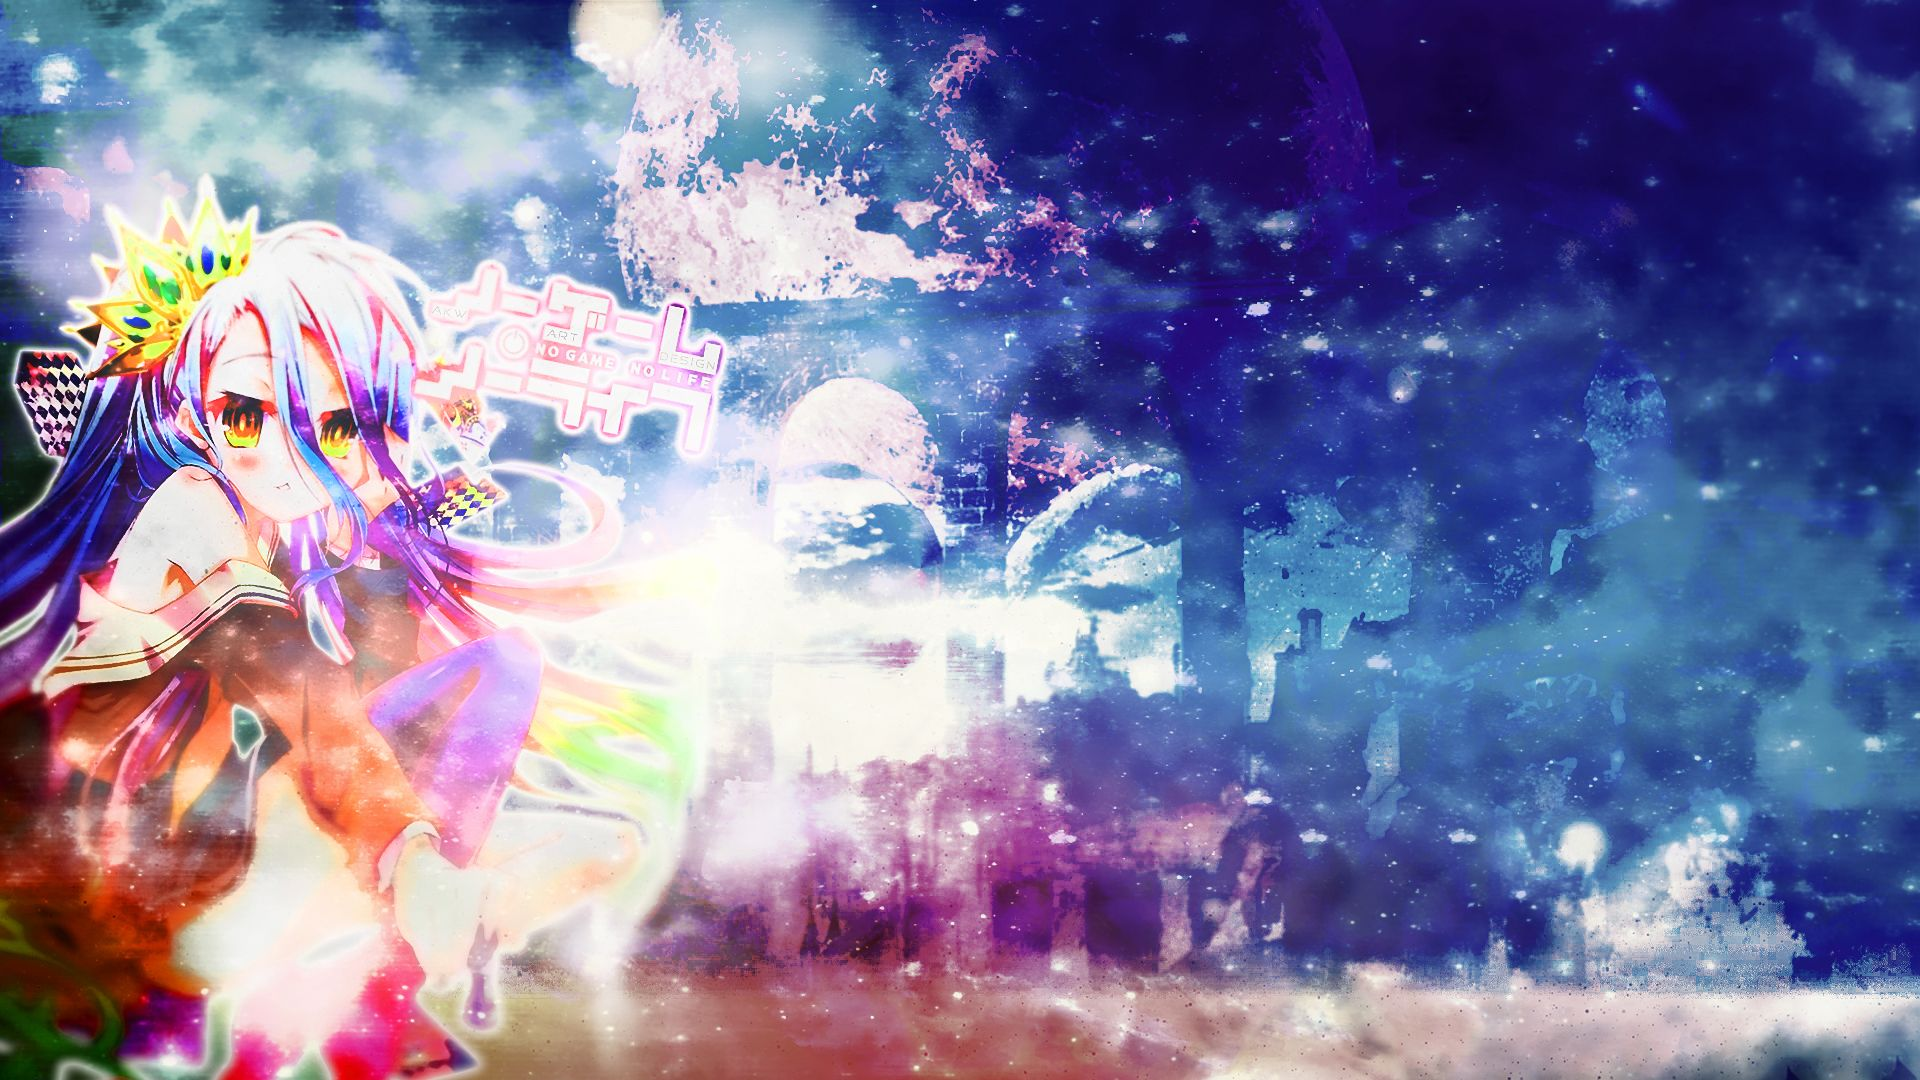 shiro girls Shiro takamachi (高町士郎 takamachi shirō) is the father of nanoha takamachi and, thus, formally the head of the takamachi family he is also one of the mikami shinto-style (御神真刀流 mikami shintō ryū) kendo successors.